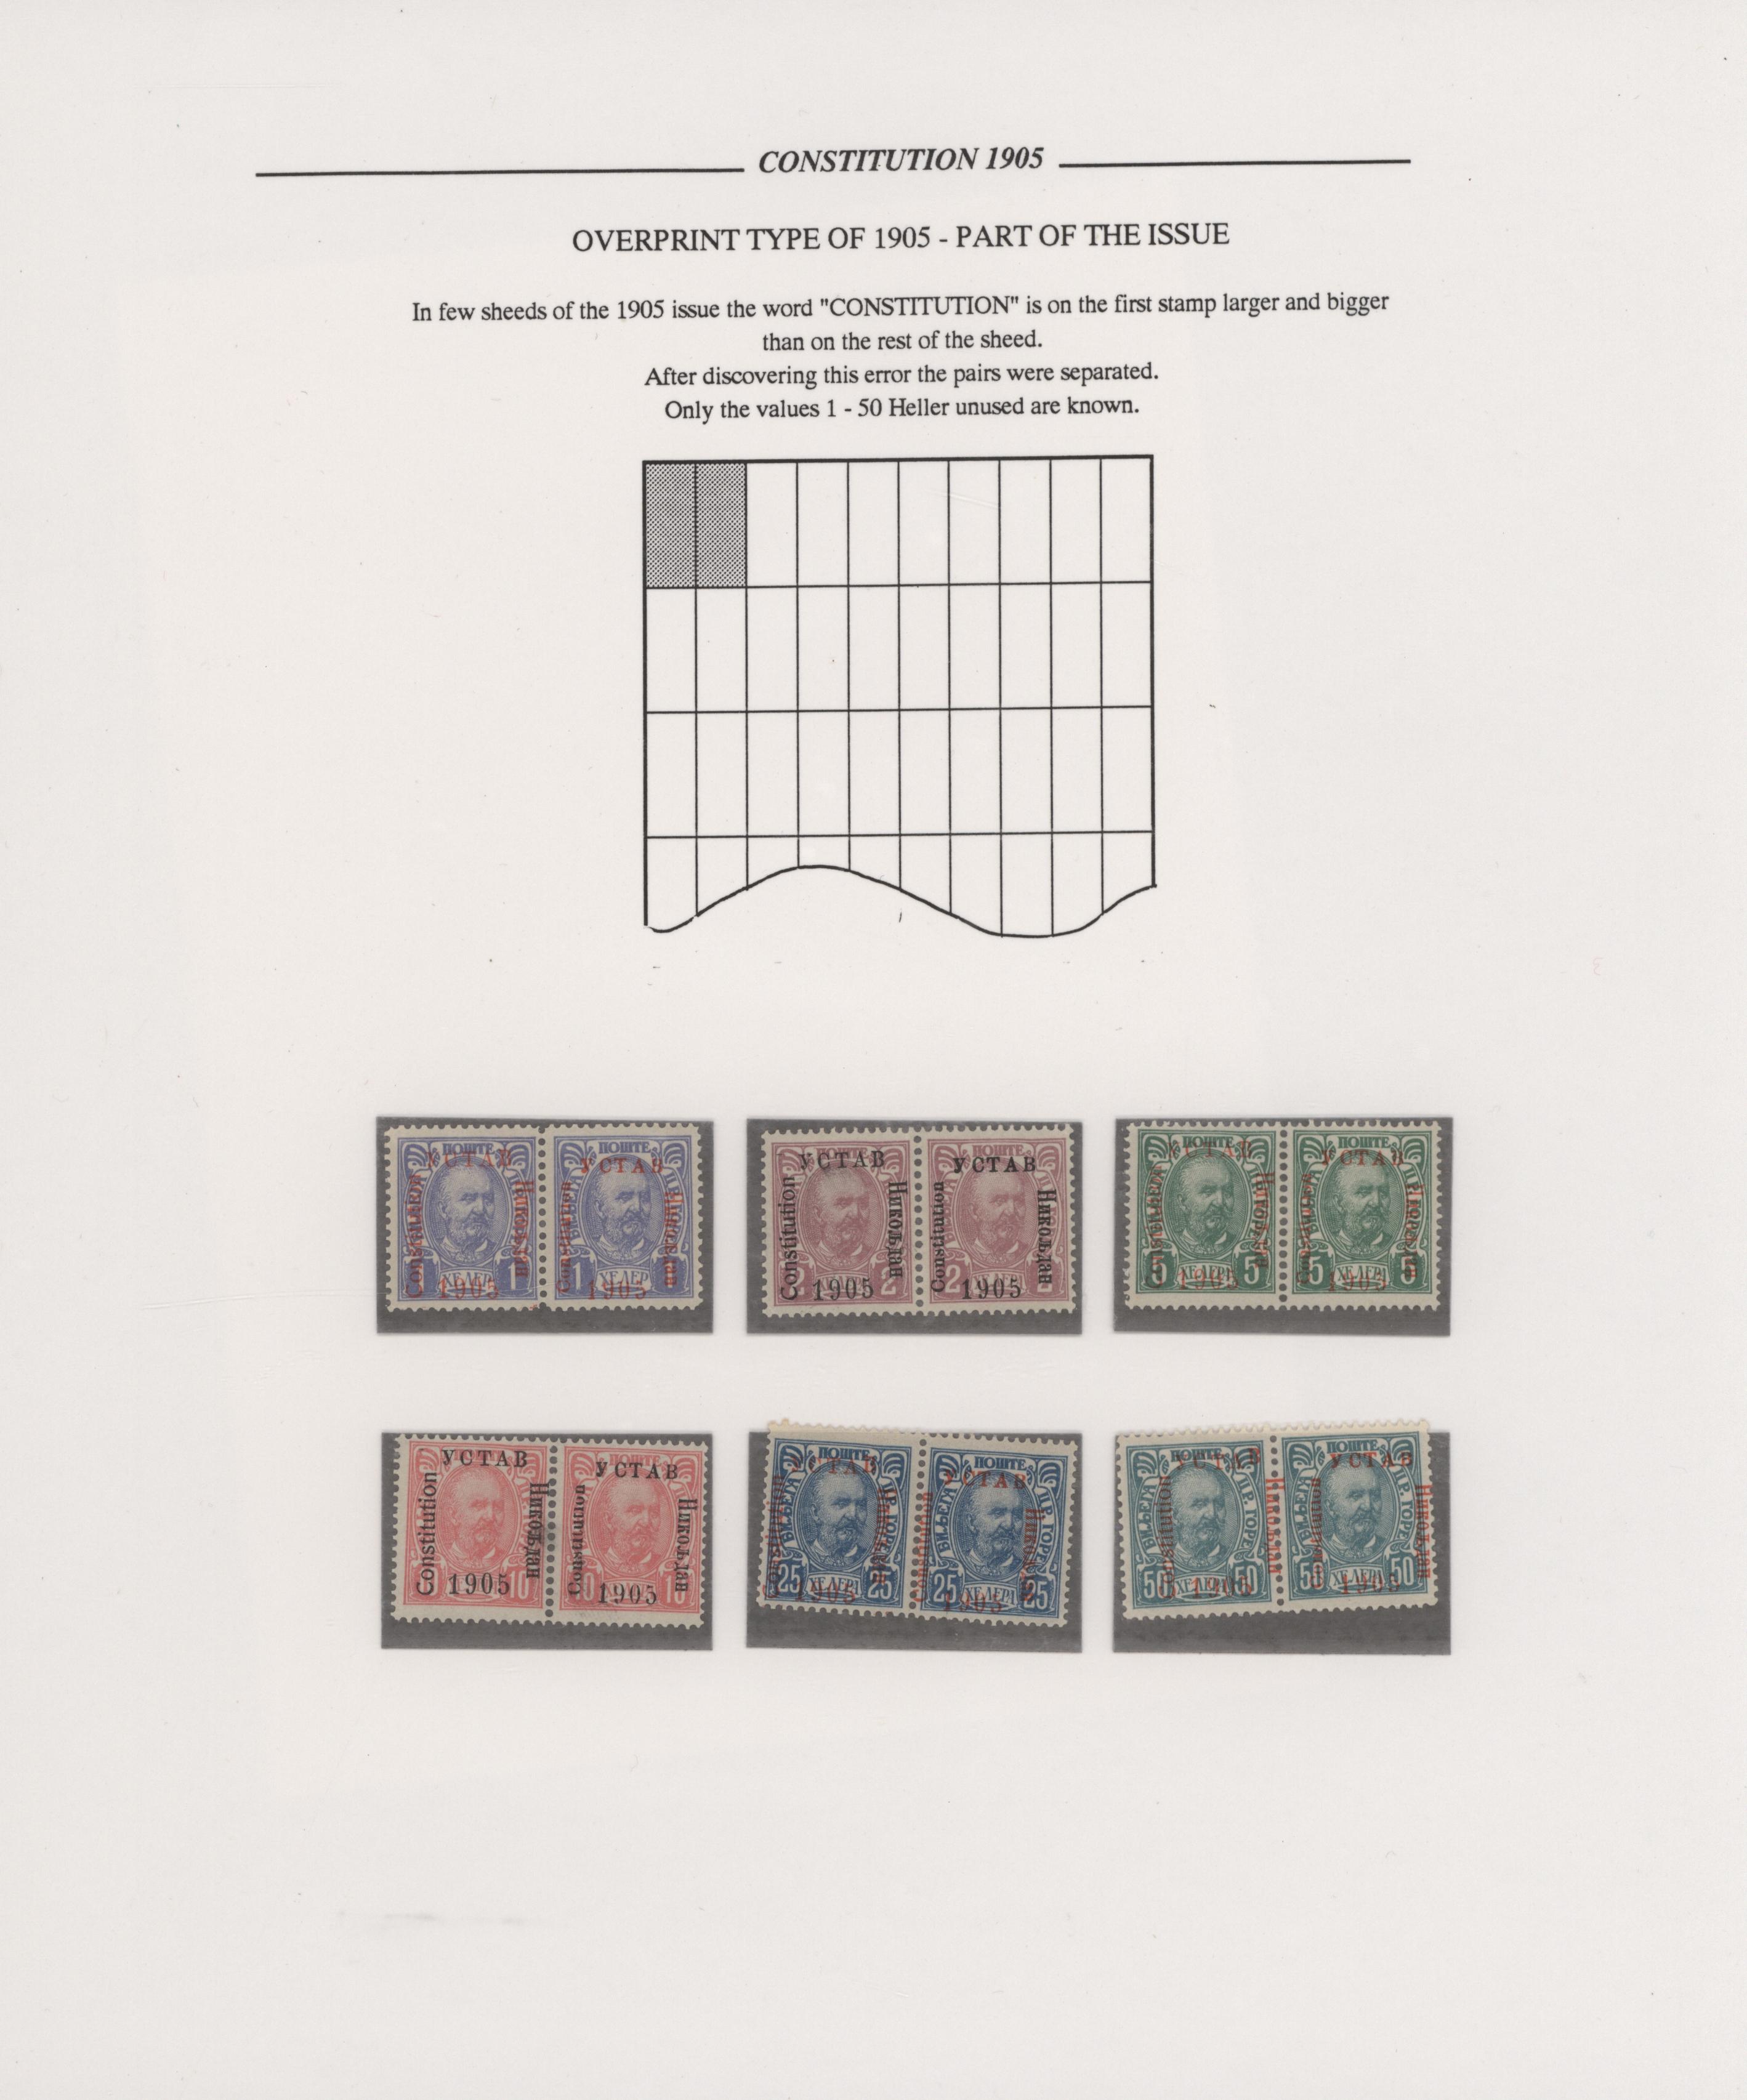 Lot 00257 - monténégro  -  Auktionshaus Christoph Gärtner GmbH & Co. KG 50th Auction Anniversary Auction - Day 8